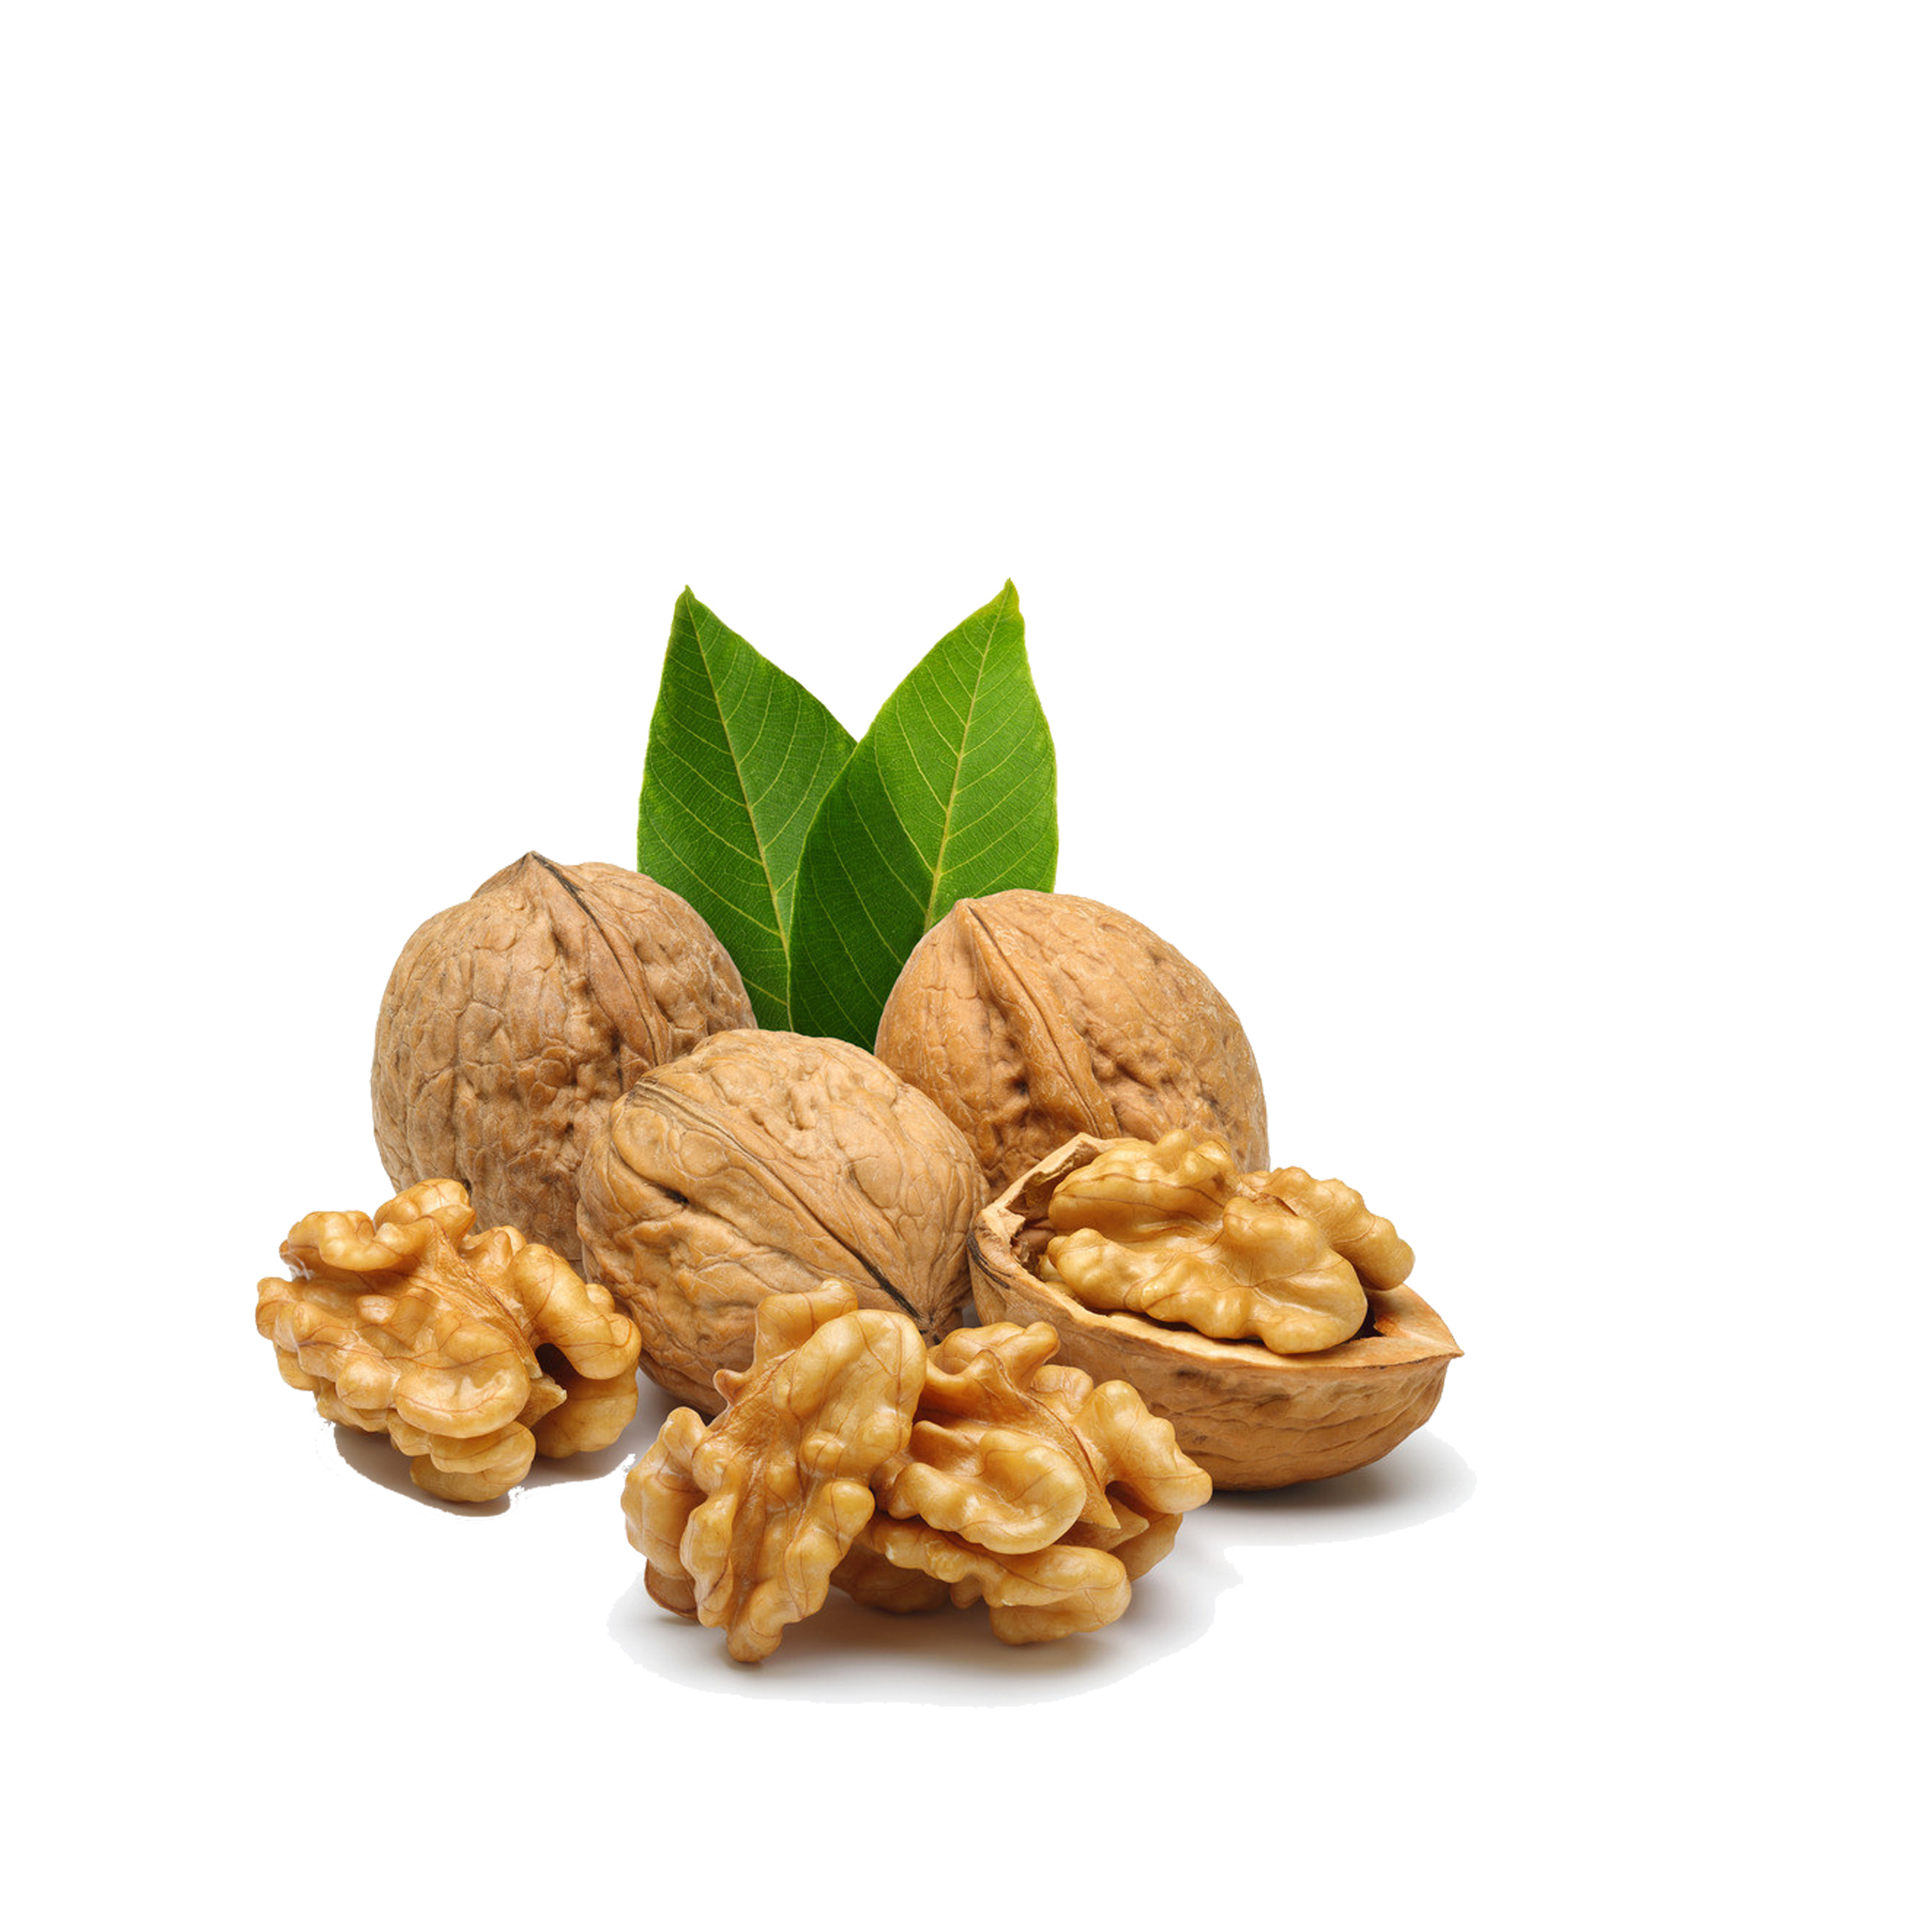 Walnut clip art transprent. Clipart food nuts